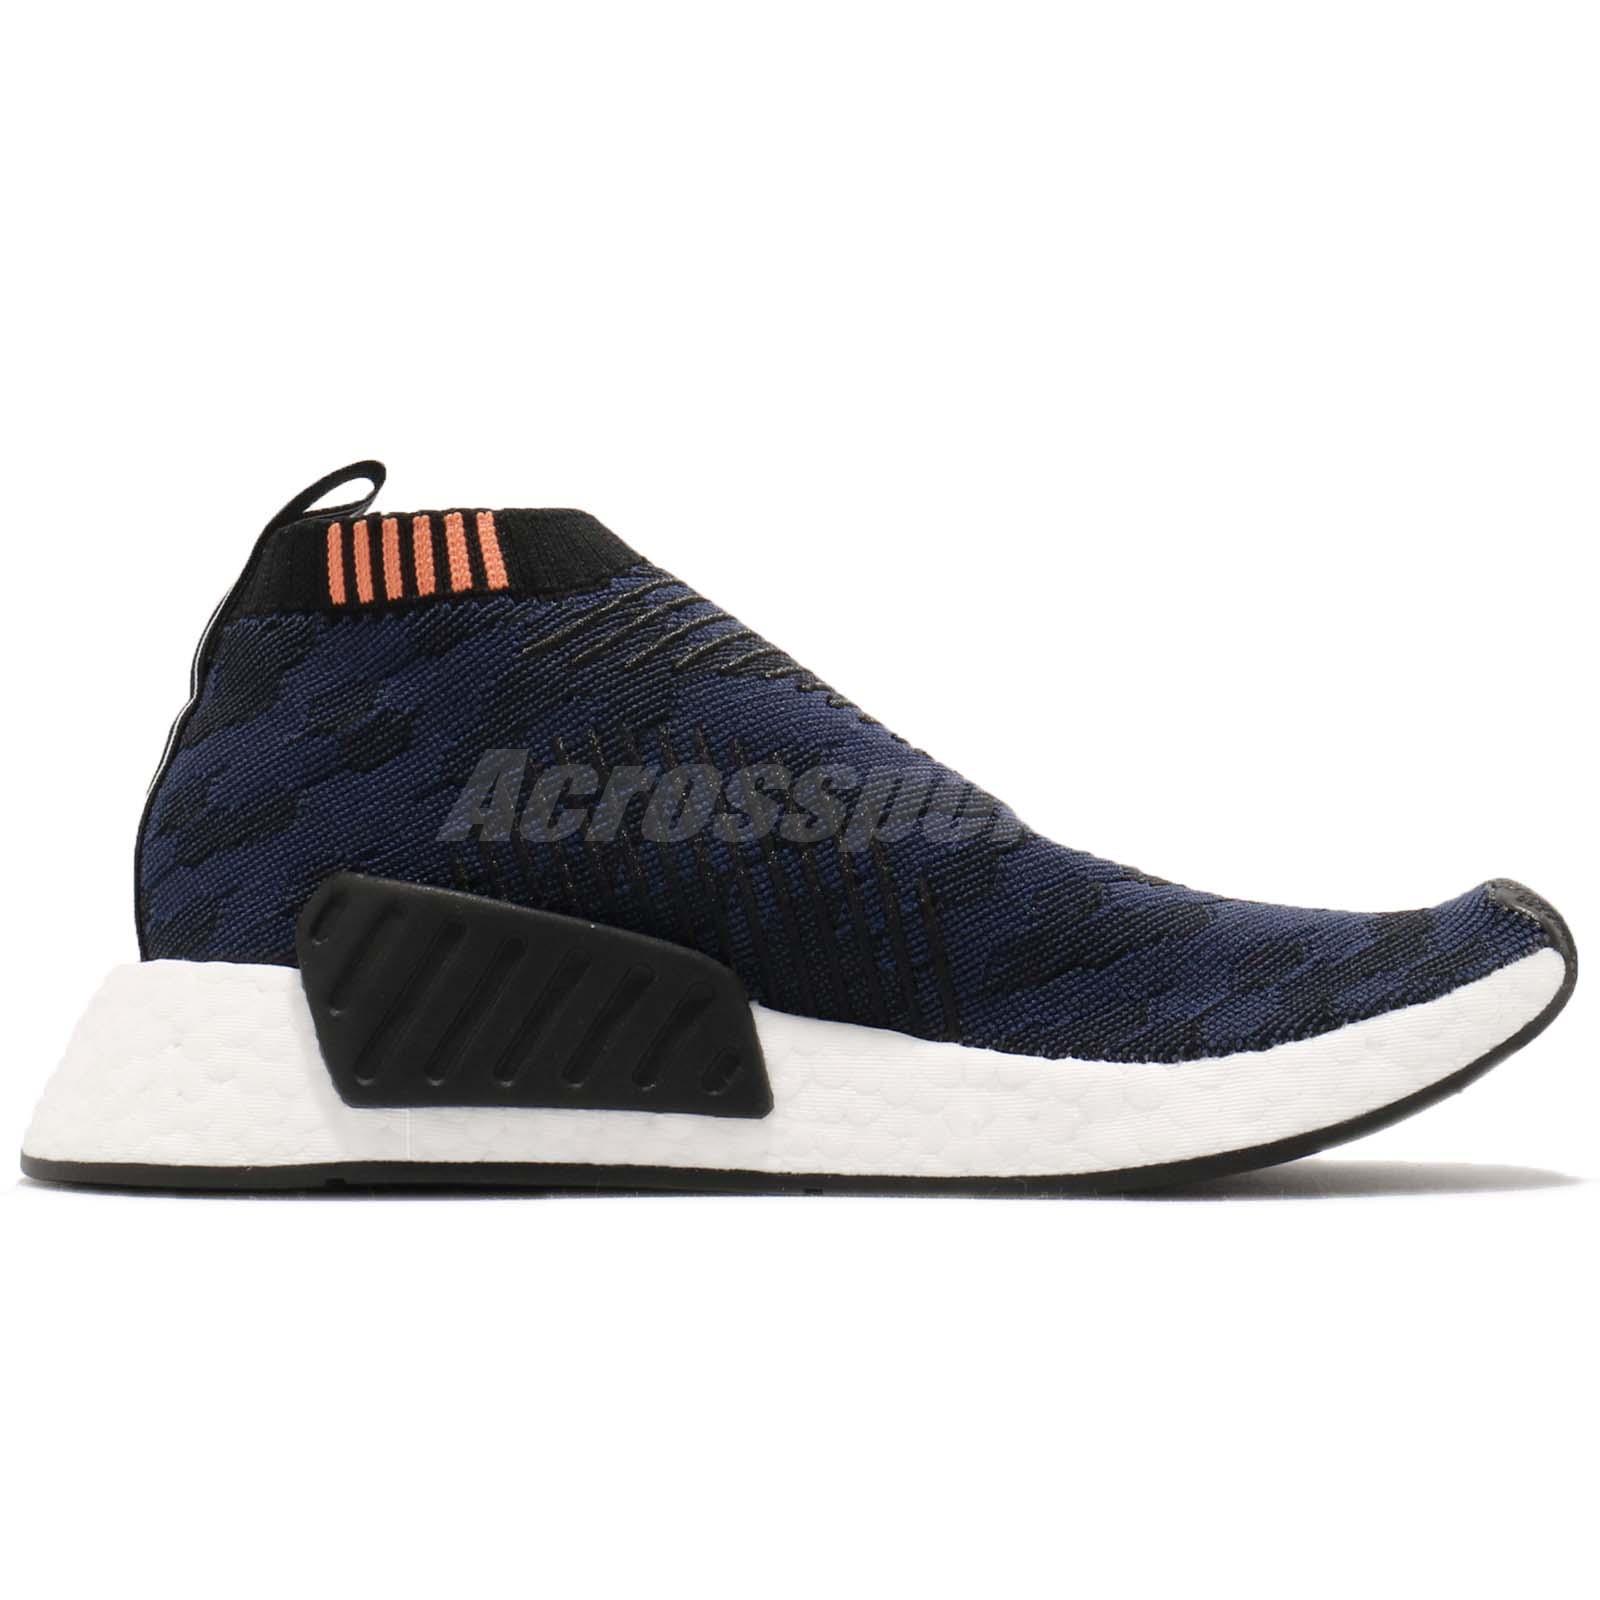 34d225ddd8f4b adidas Originals NMD CS2 PK W Left Foot With Discoloration Women ...